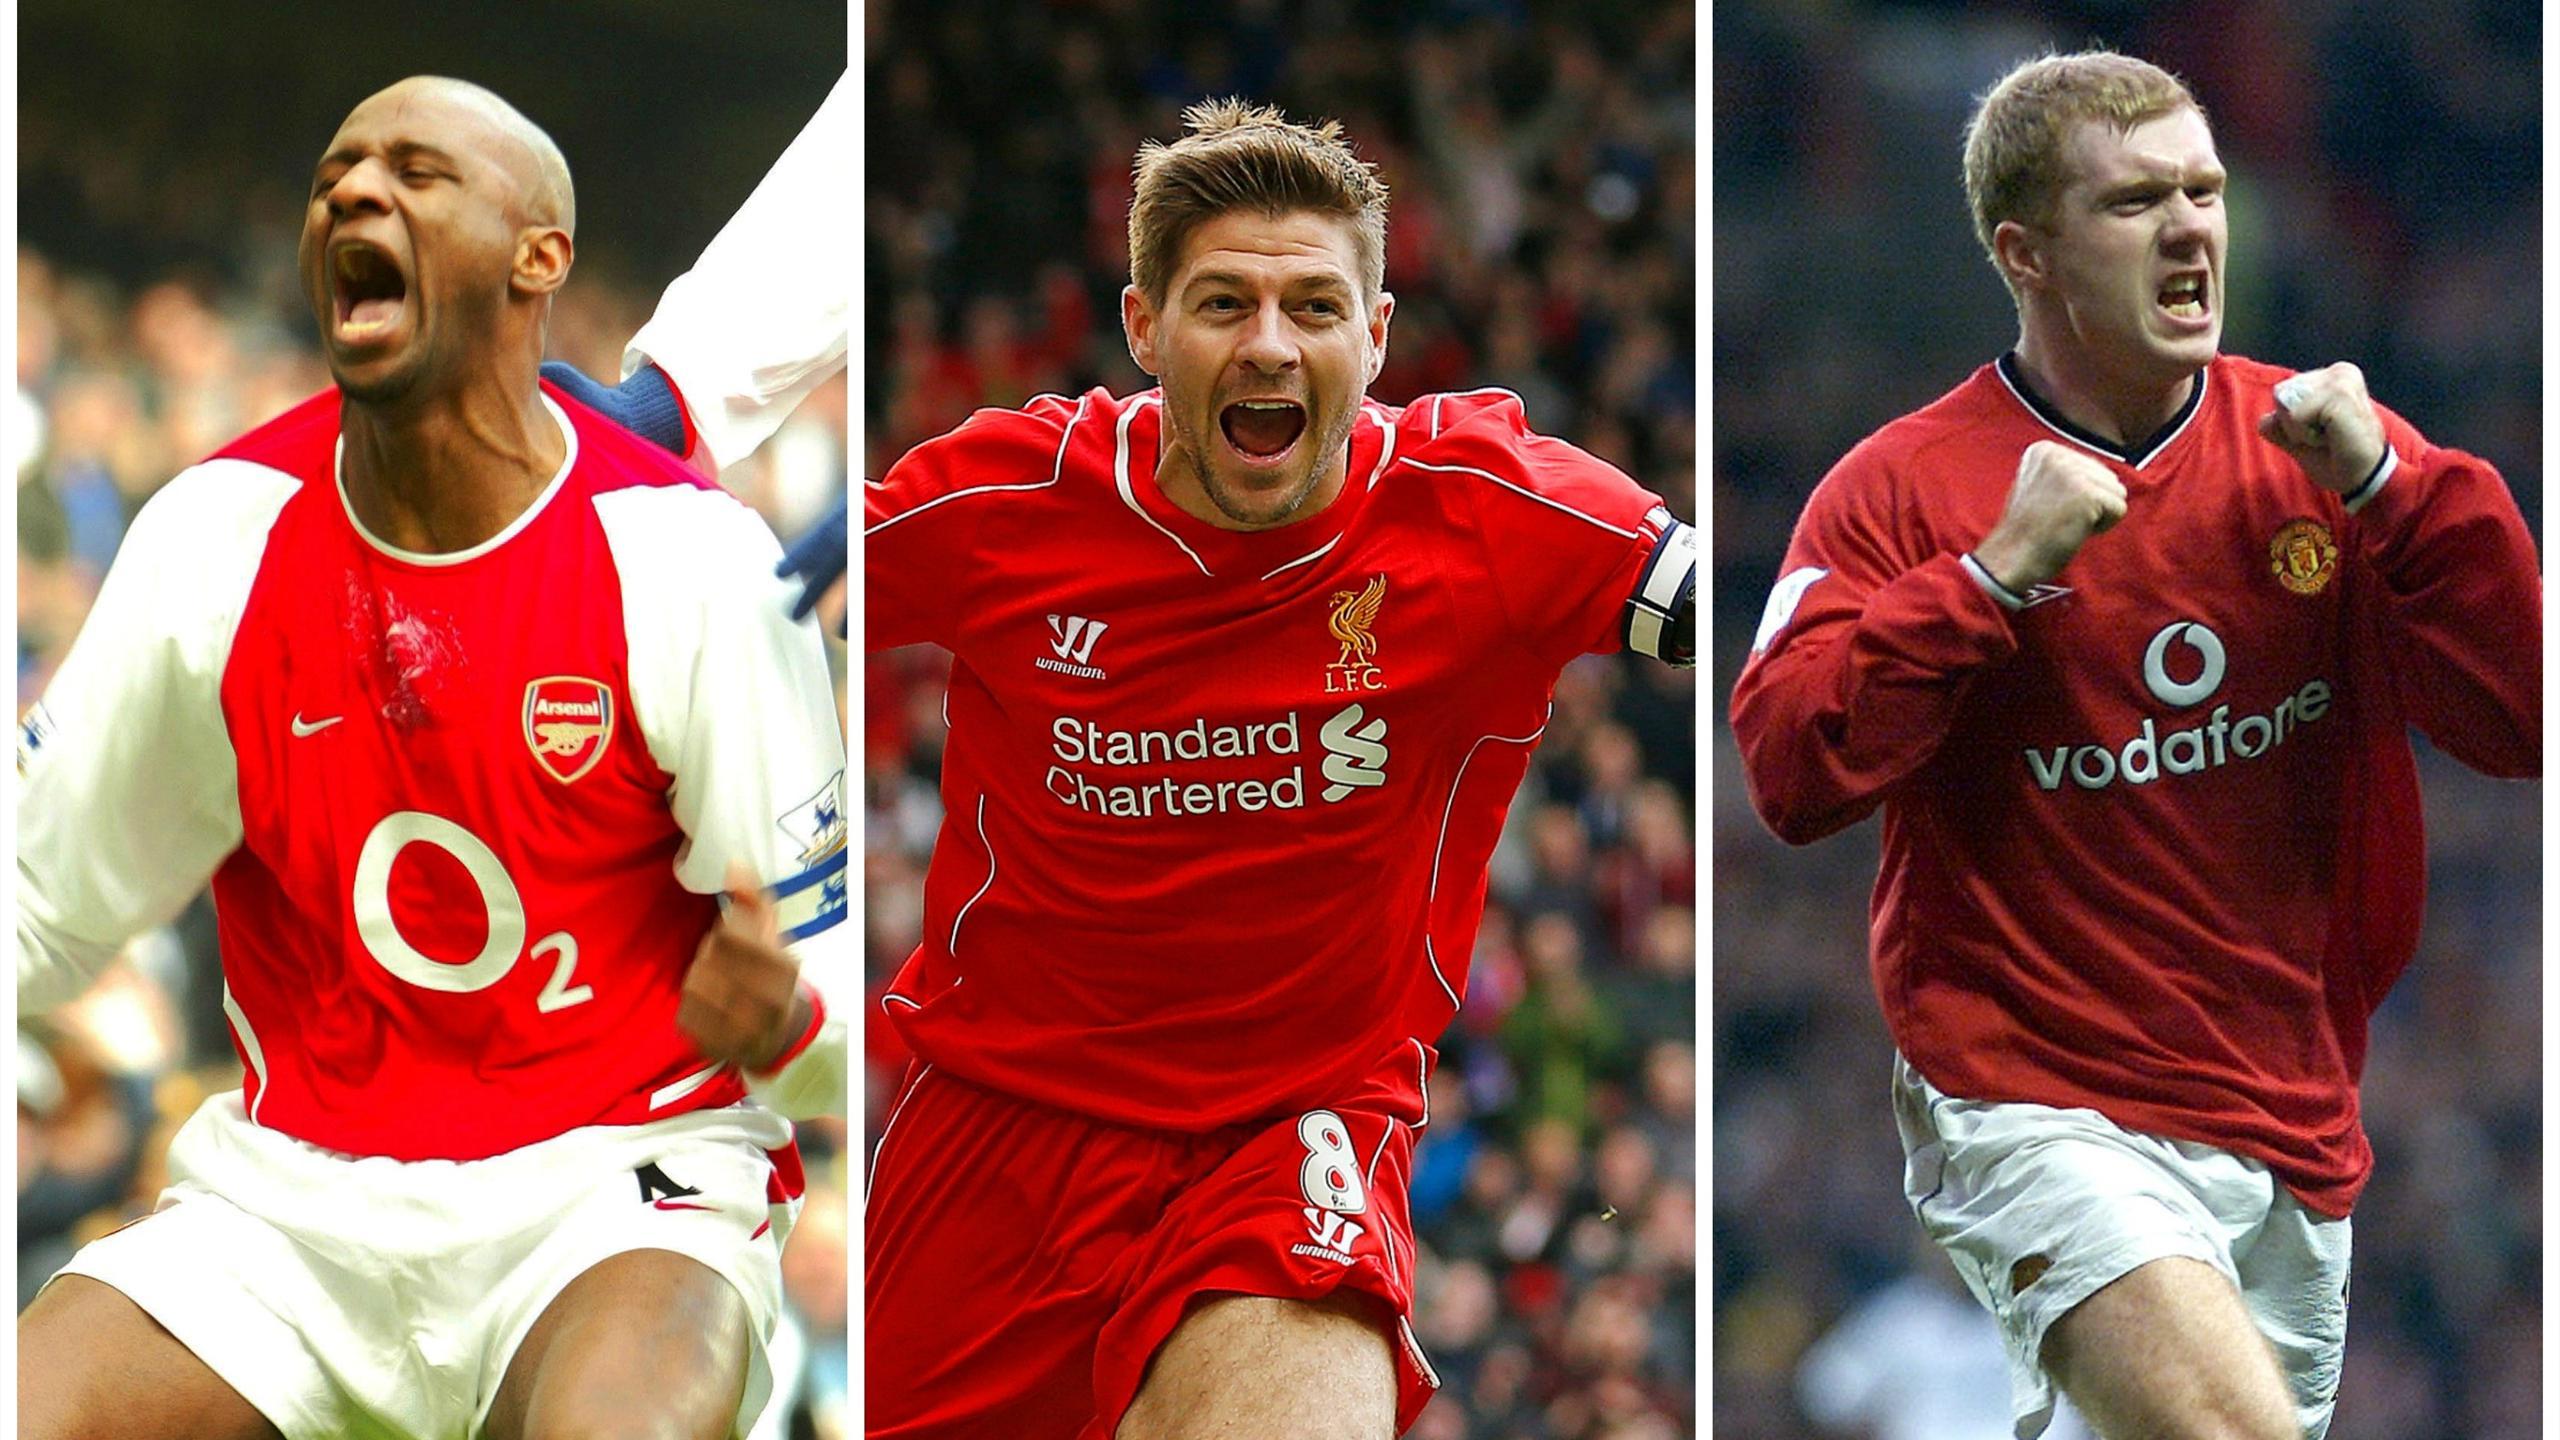 Patrick Vieira, Steven Gerrard and Paul Scholes